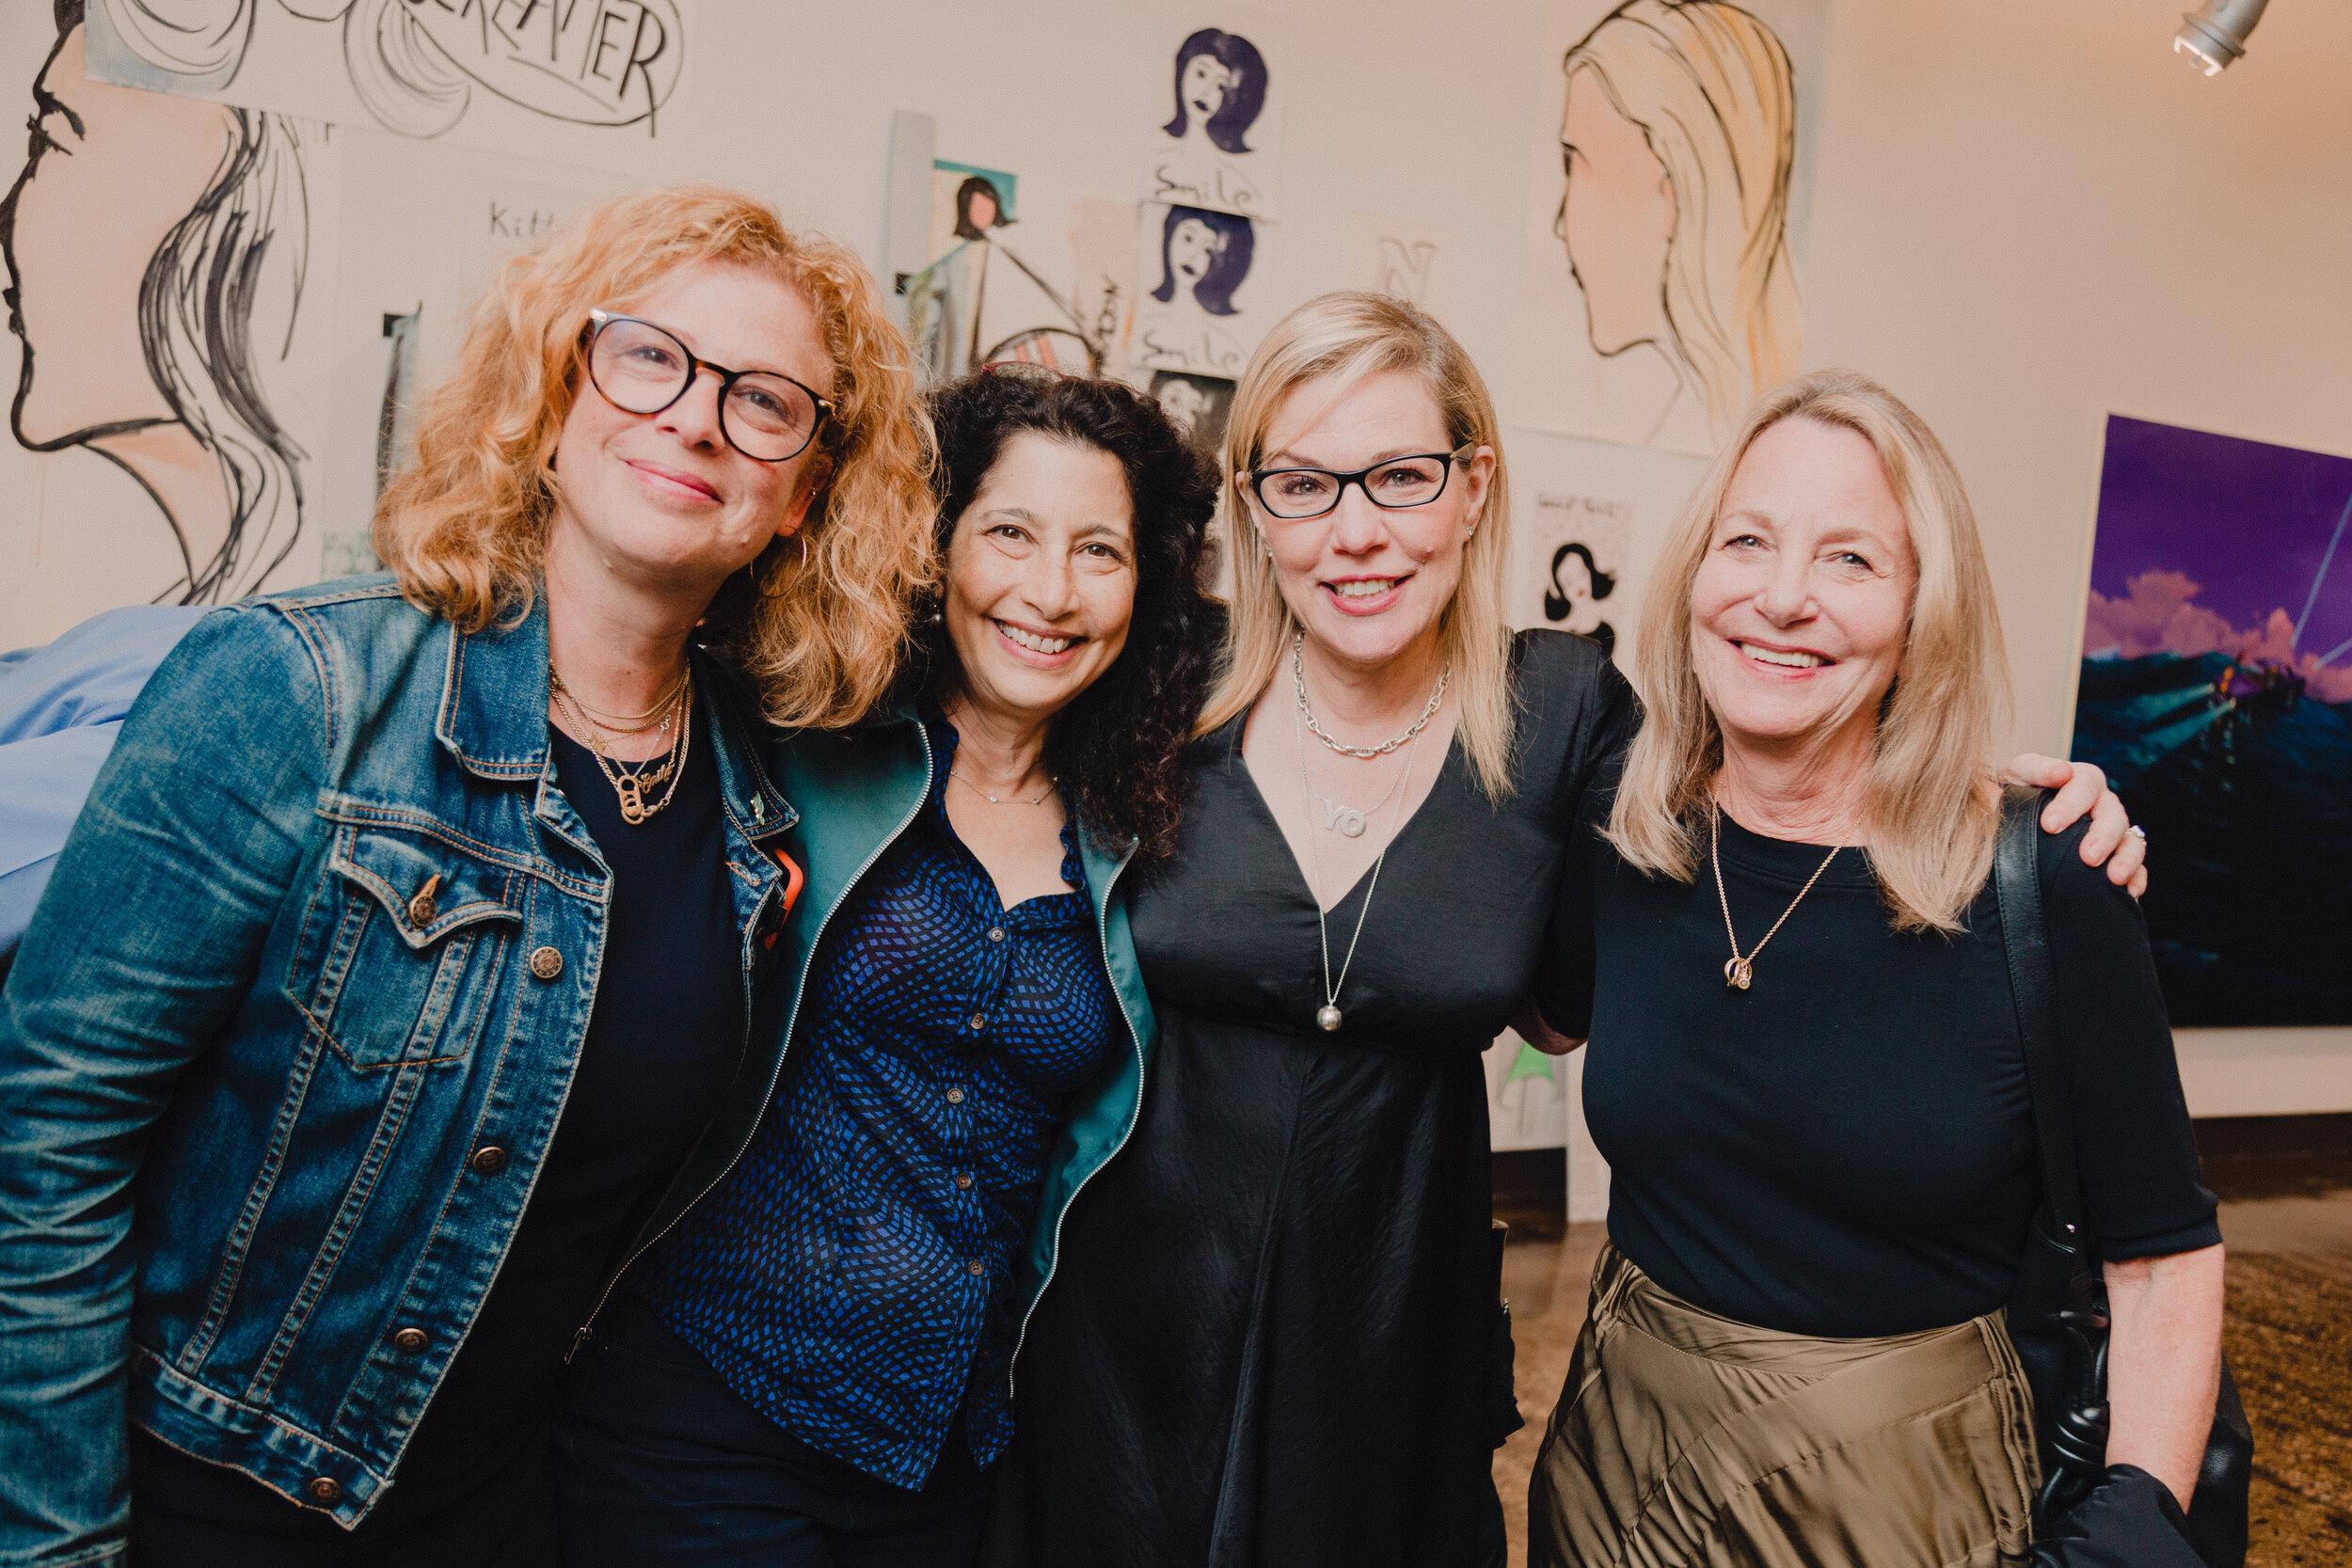 Emily Oberman, Chee Pearlman, Debbie Millman, and Paula Scher